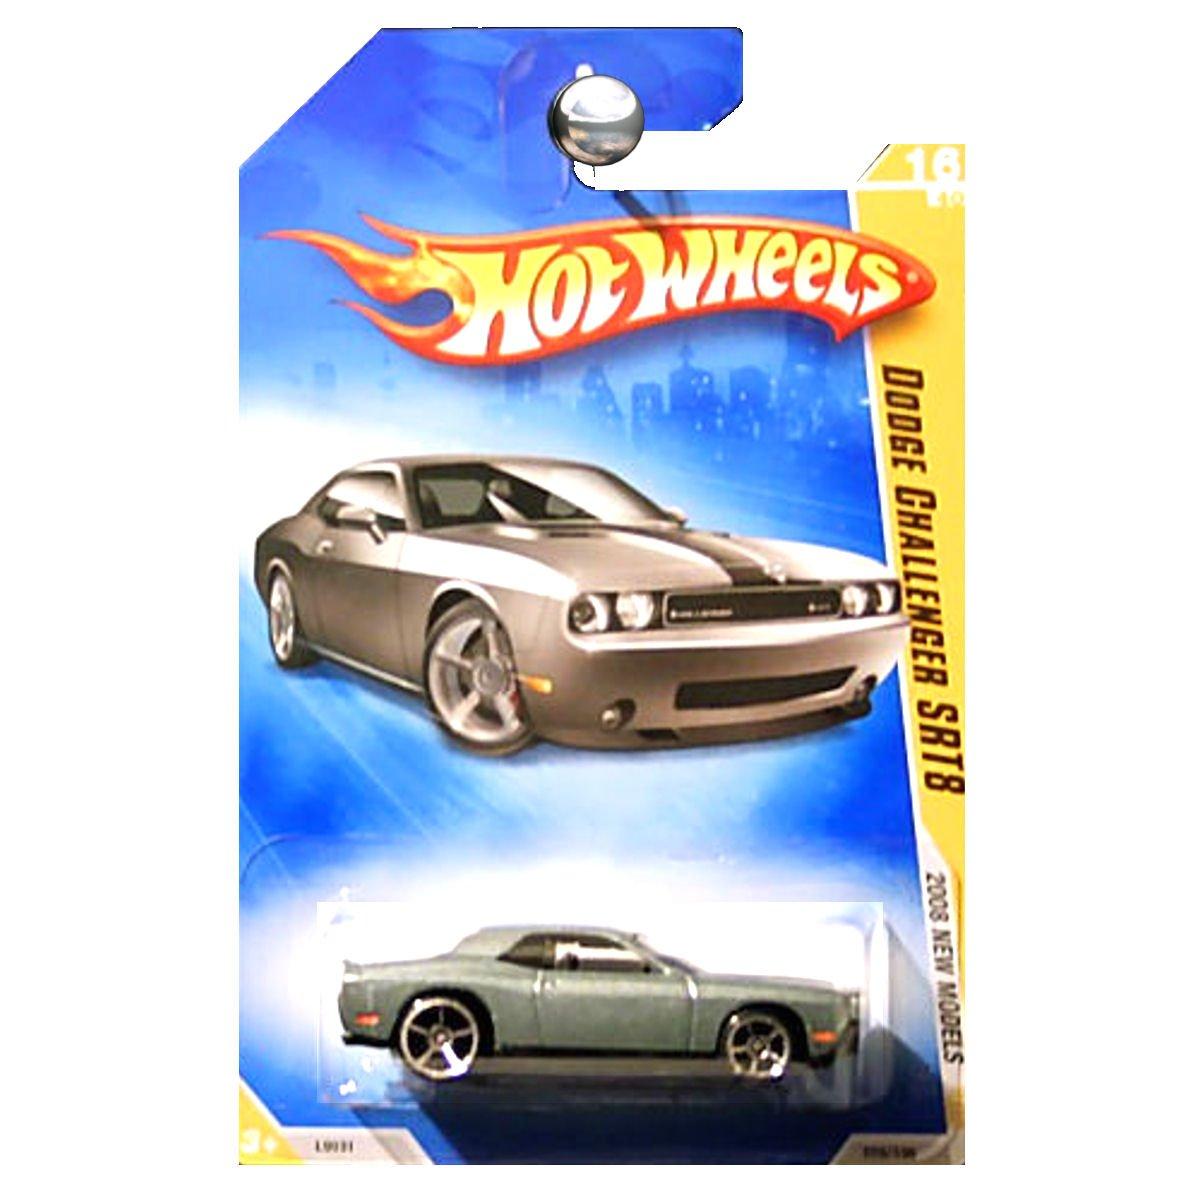 Hot Wheels 2008 New Models Dodge Challenger SRT8 Grey Gray Silver with Black Stripes